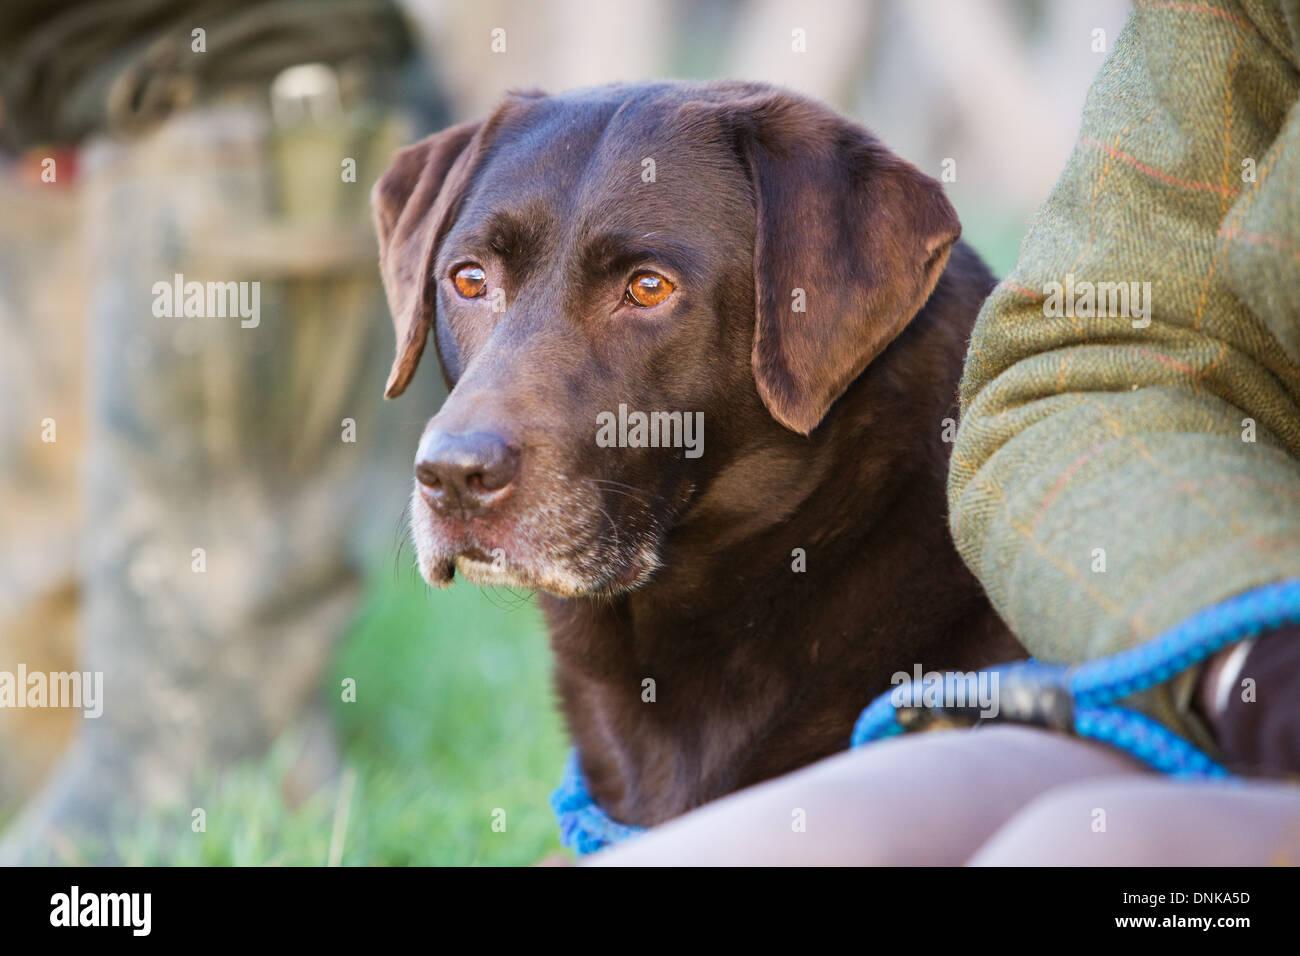 A Chocolate Labrador Retriever on a pheasant shoot in England - Stock Image